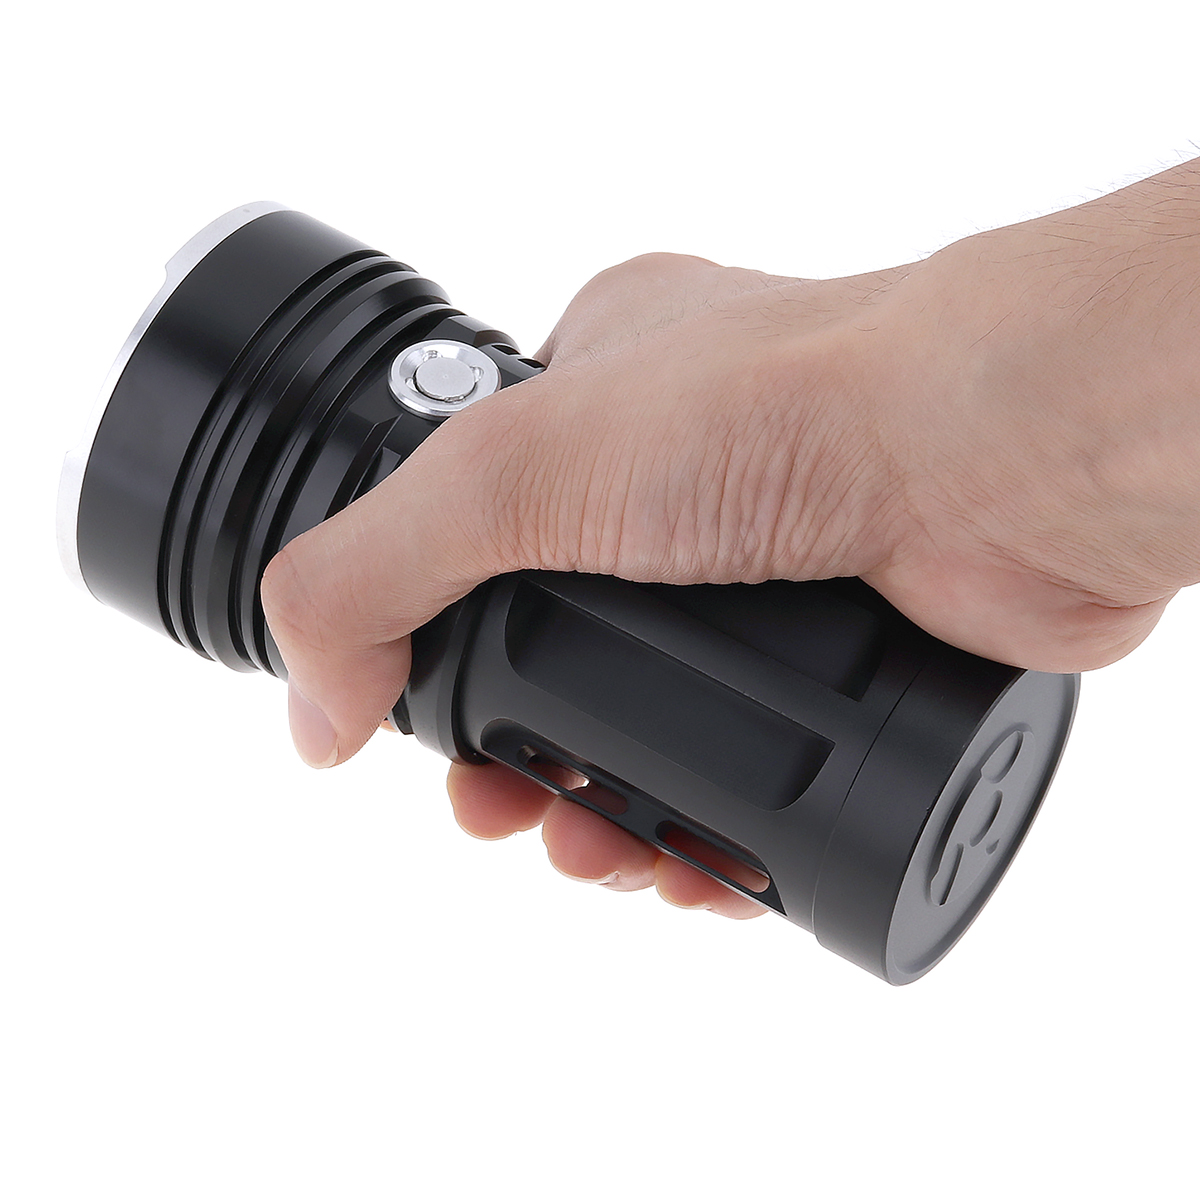 40000LM-18-x-CREE-XM-L-T6-LED-4-Modes-Flashlight-Torch-4-x-18650-Hunting-Lamp thumbnail 7